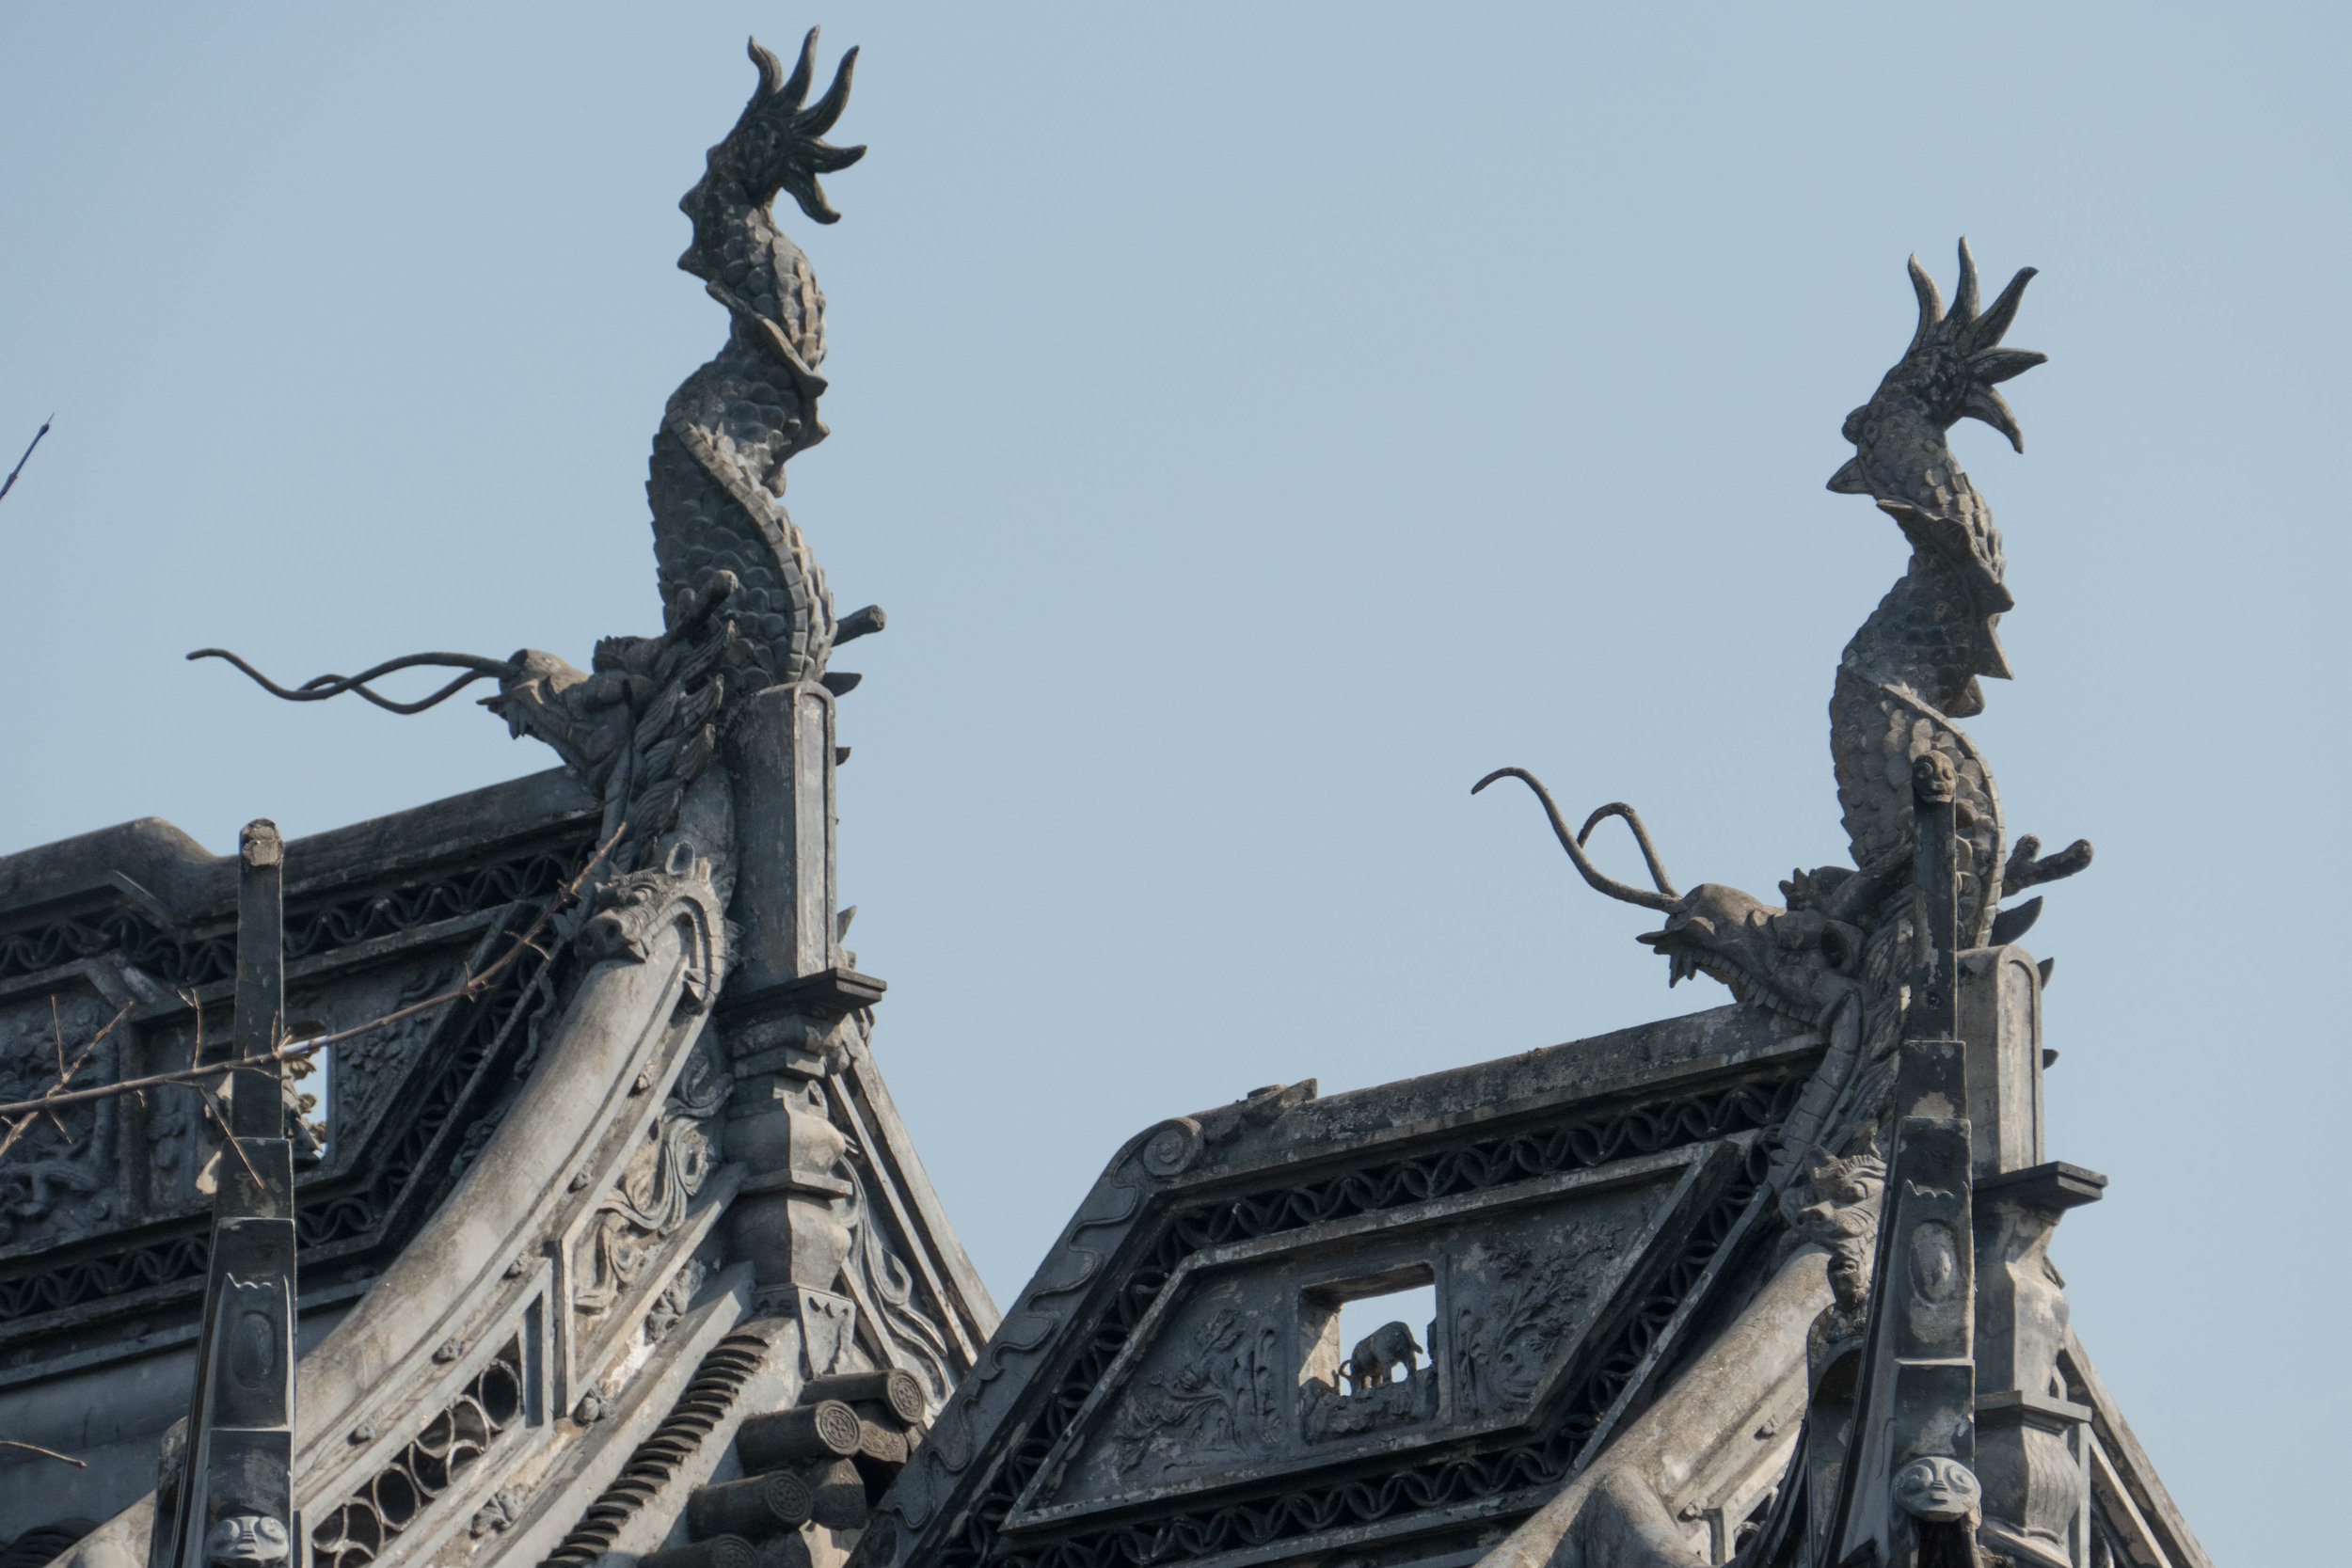 Rooftop gargoyles